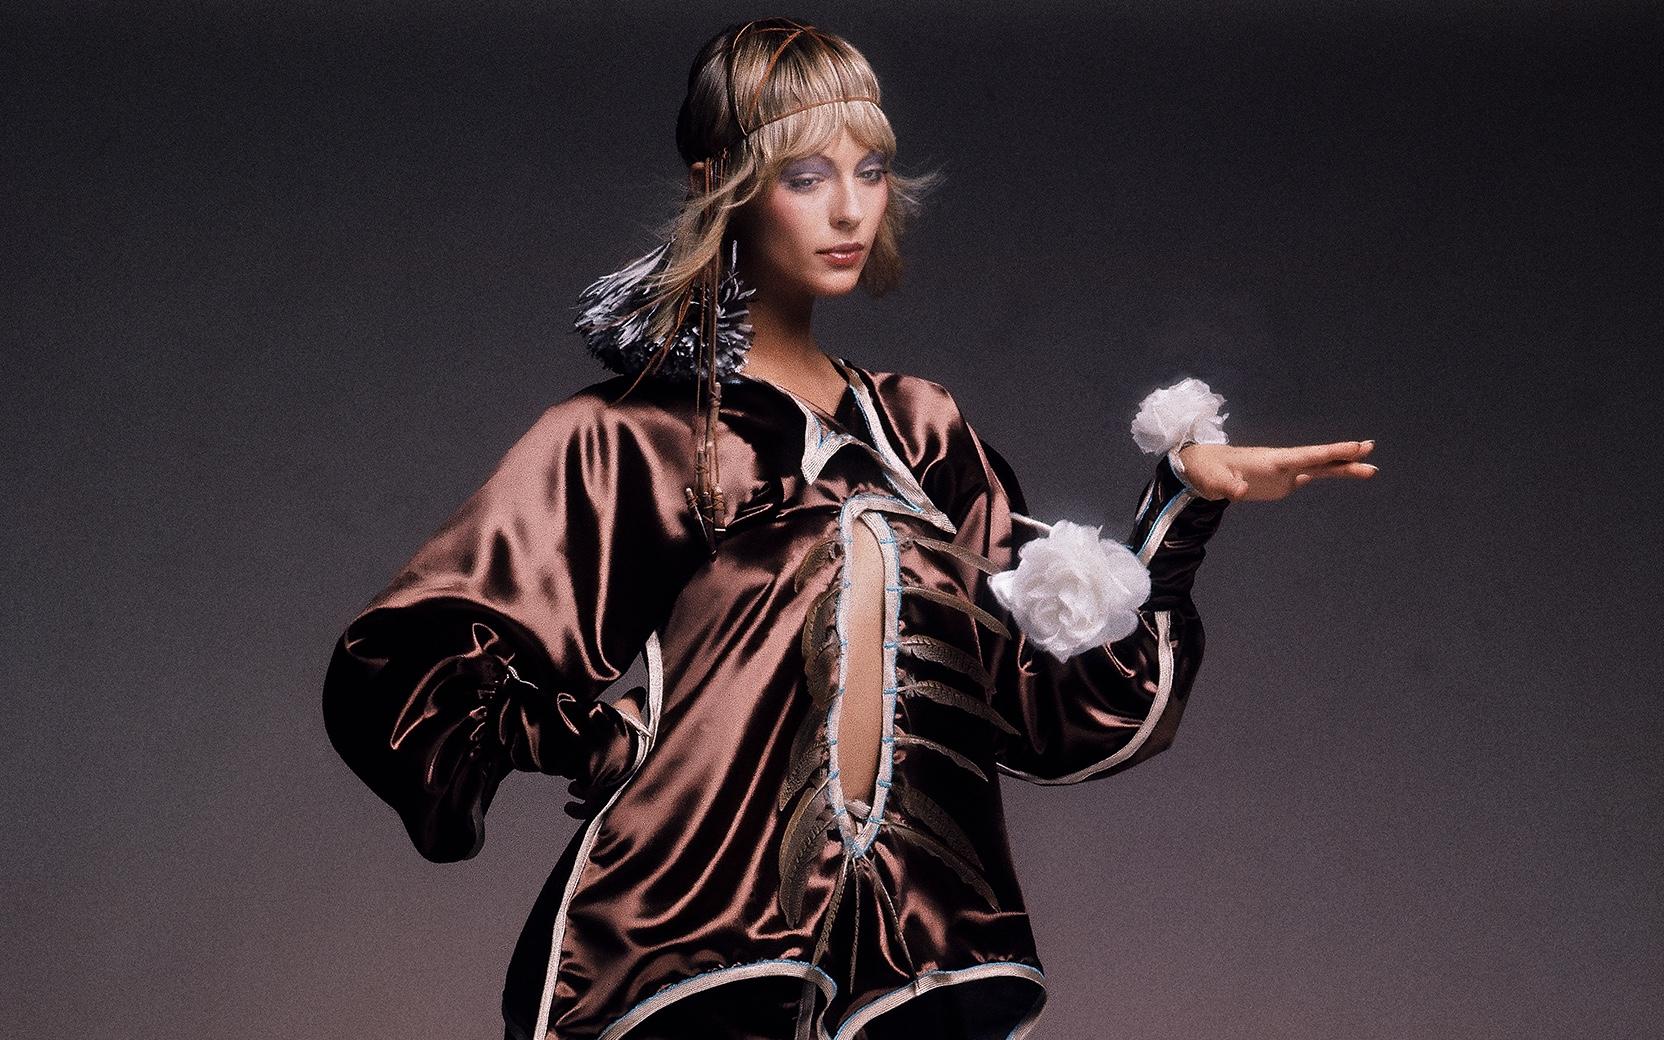 ELAB-644-Ann-Bronze-Velvet--art-Arrowsmith©